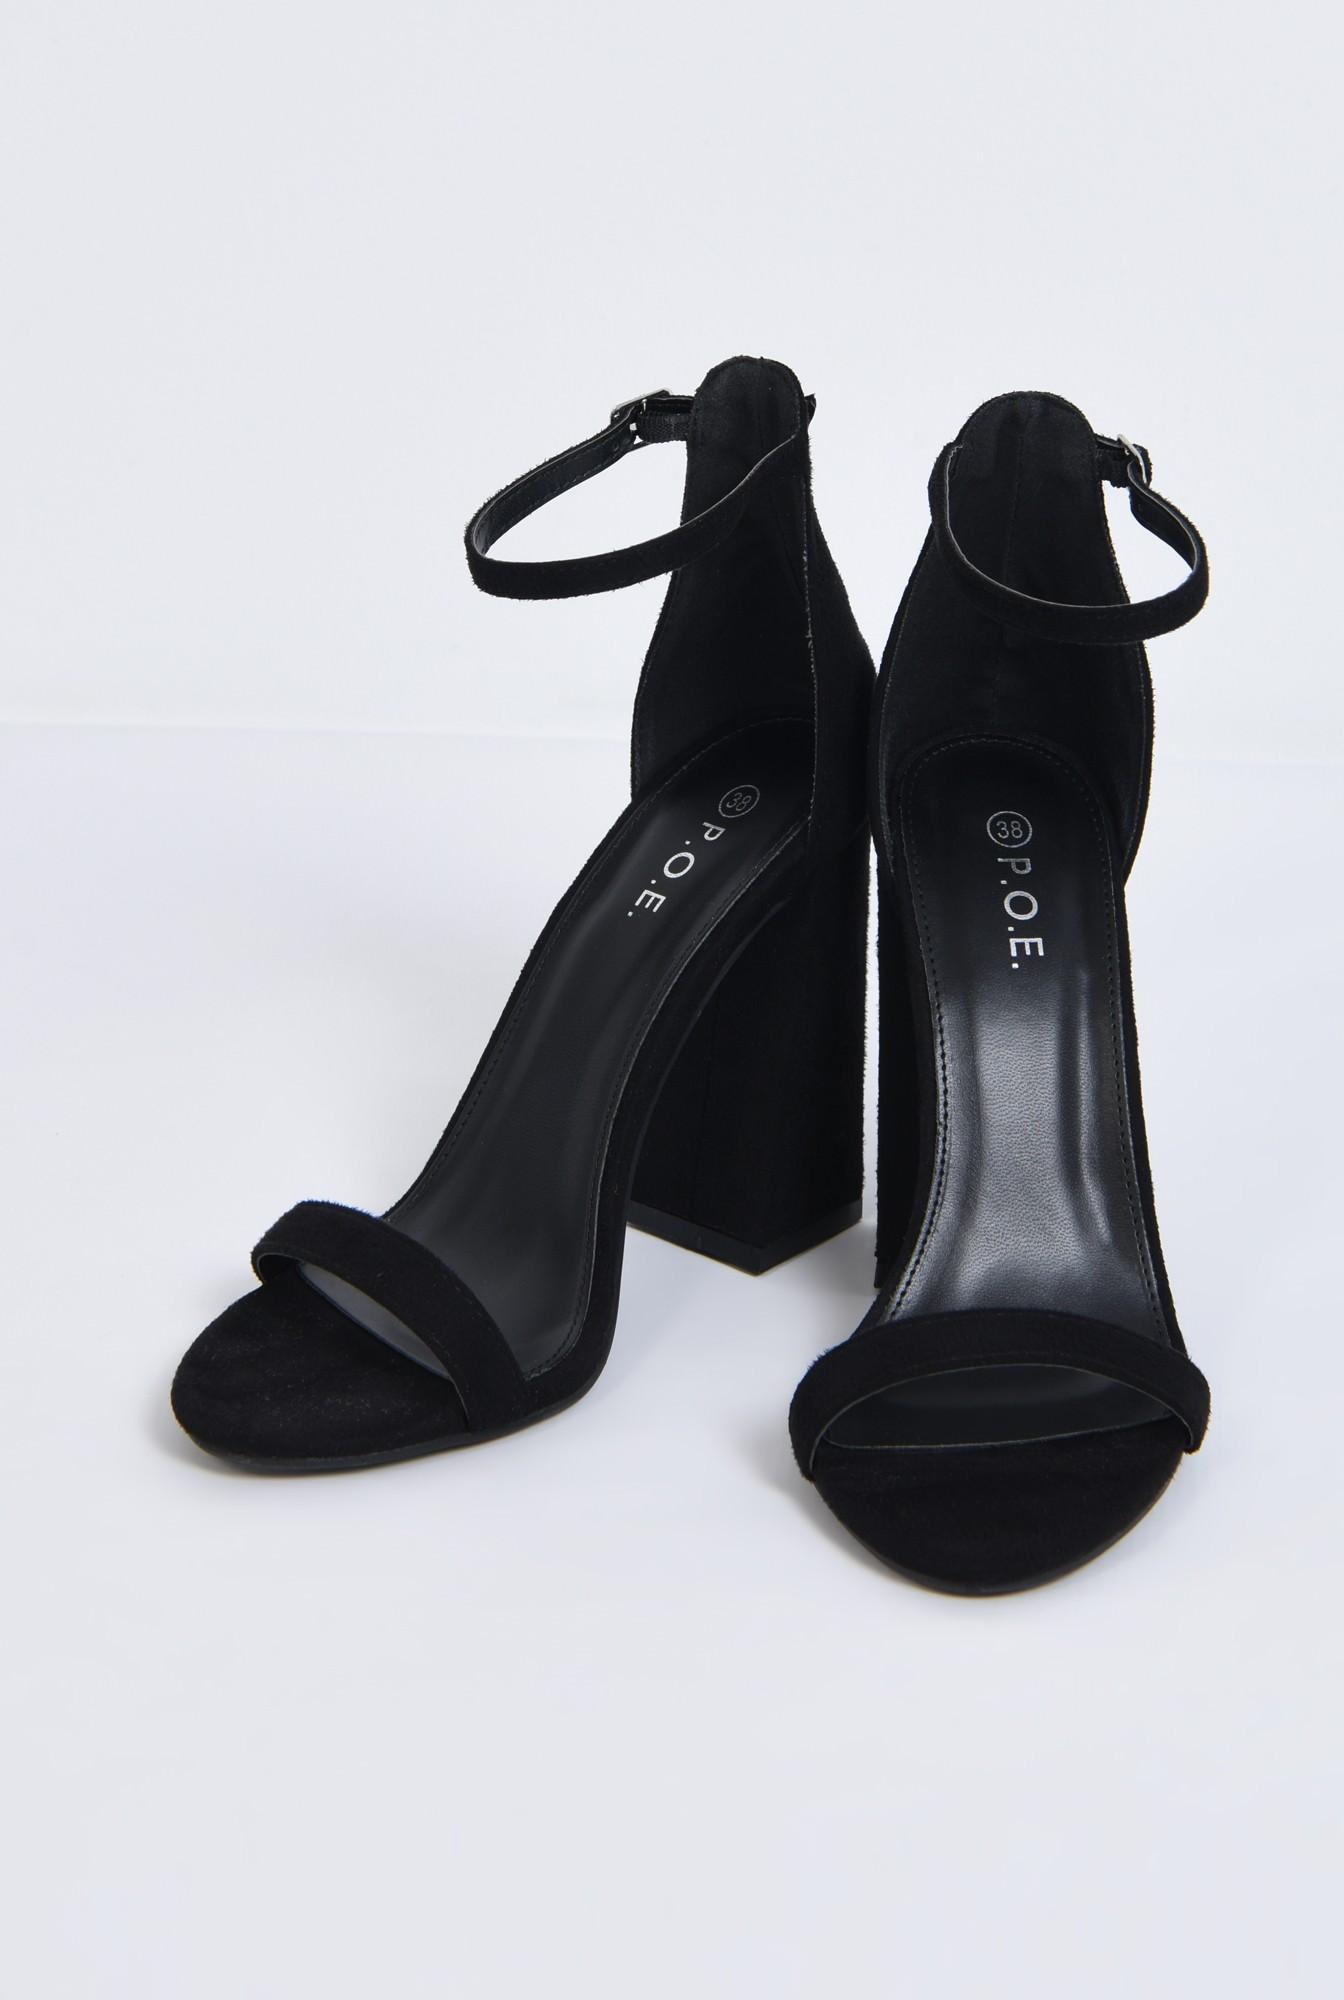 2 - sandale toc inalt, piele ecologica